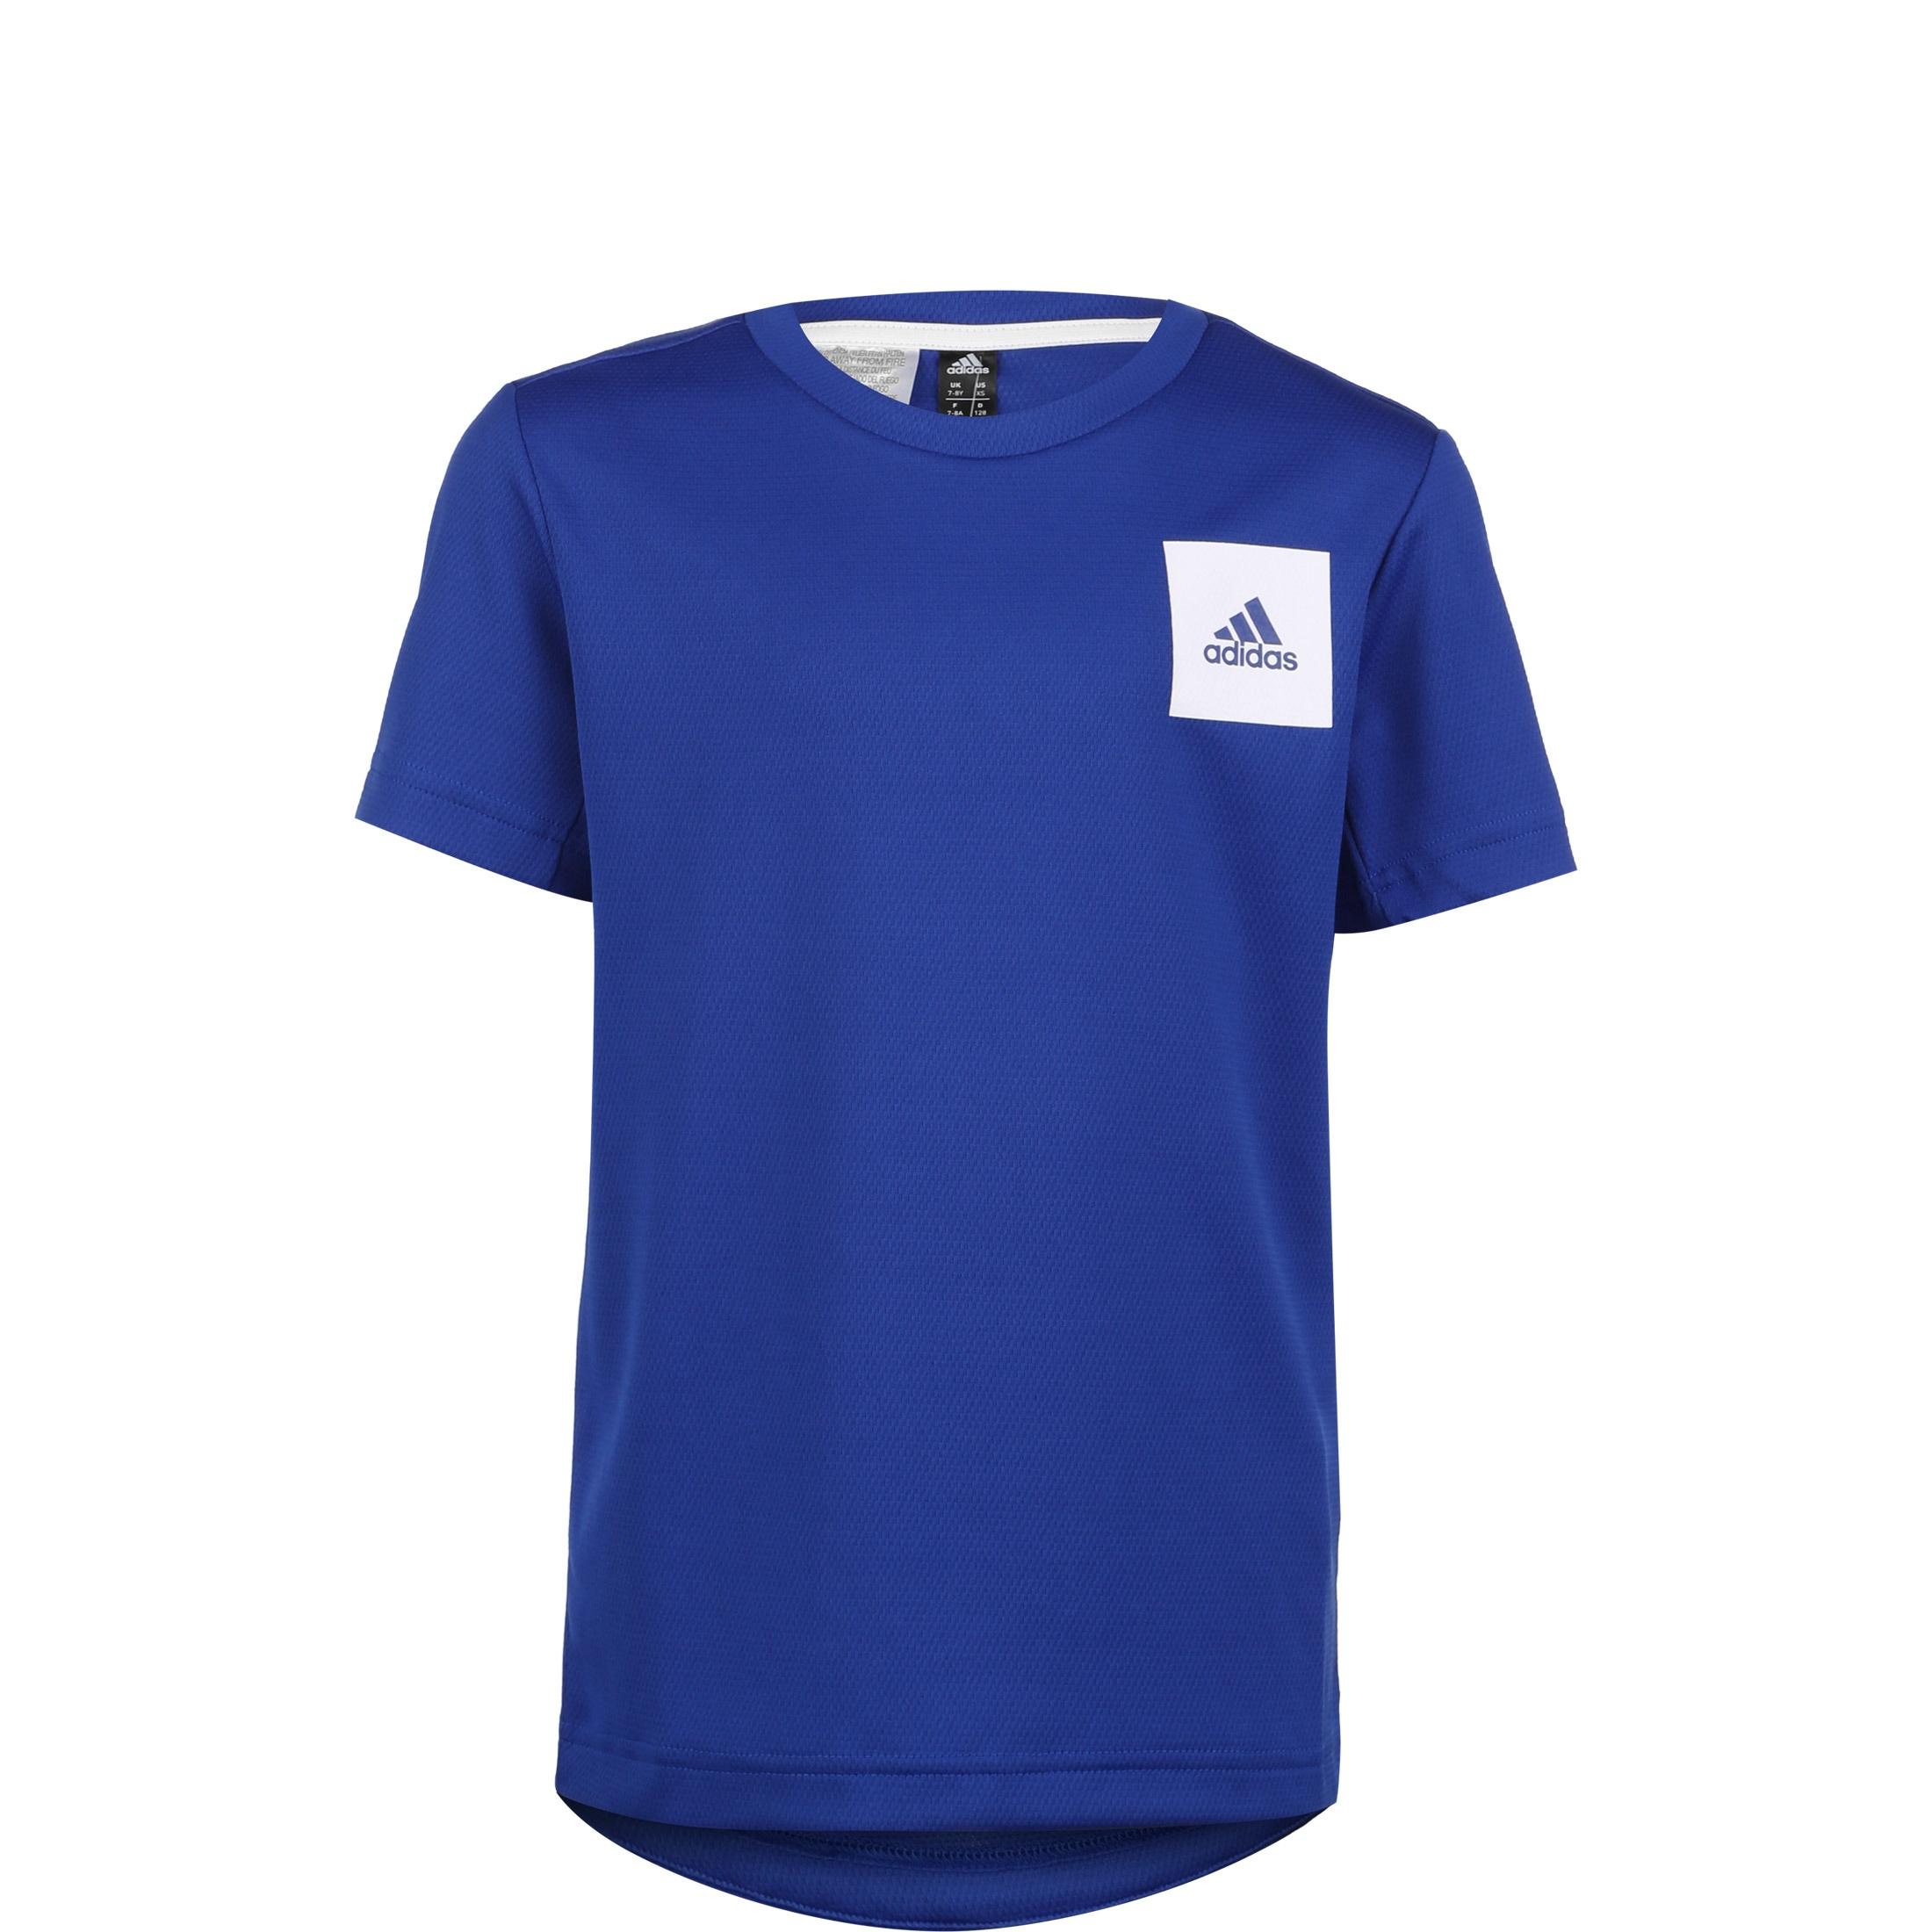 adidas Performance Trainingsshirt Aeroready blau Kinder Sport Shirts Sportmode Jungenkleidung T-Shirts